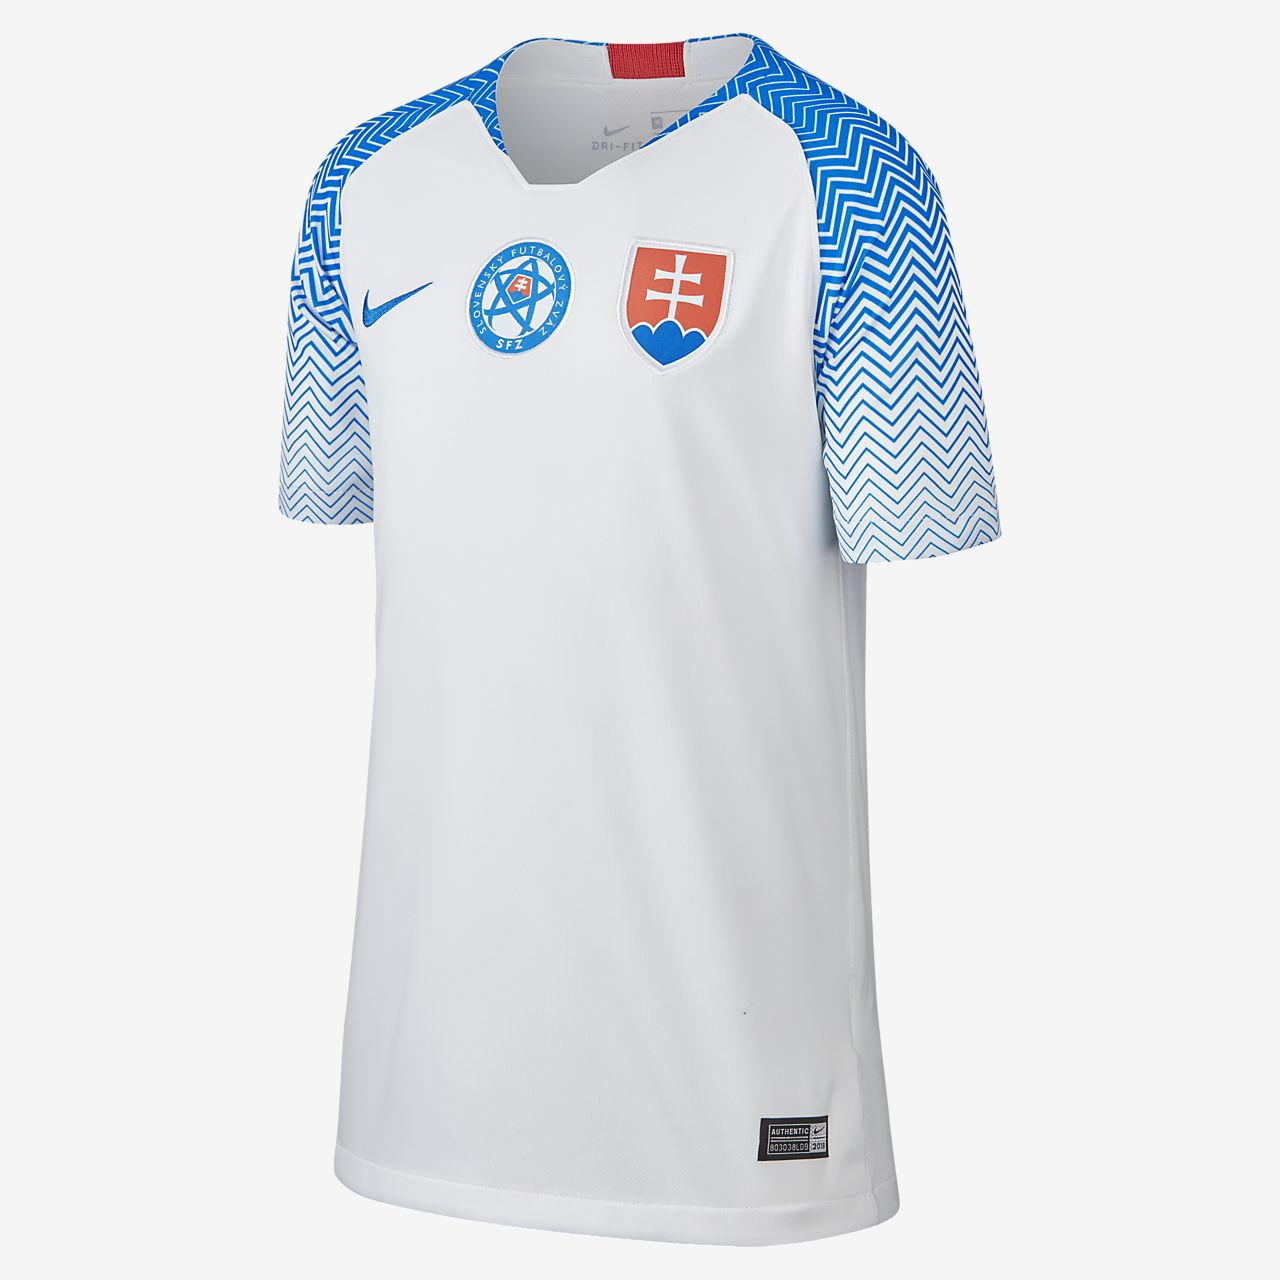 2018 Slowakei Stadium Home Fußballtrikot für ältere Kinder